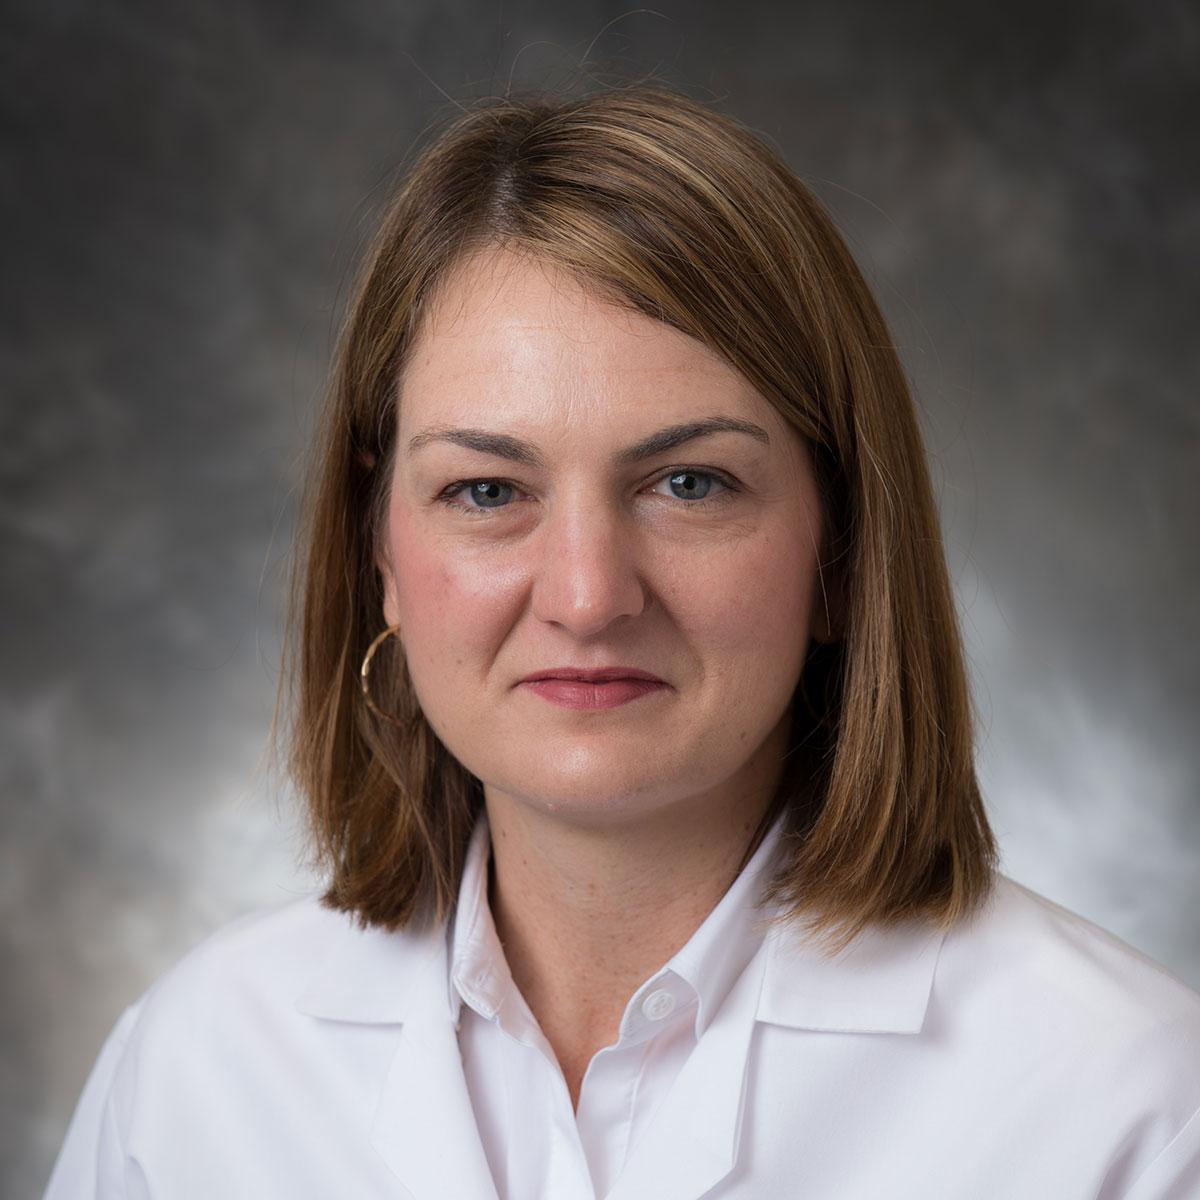 A friendly headshot of Dr. Melissa Schepp